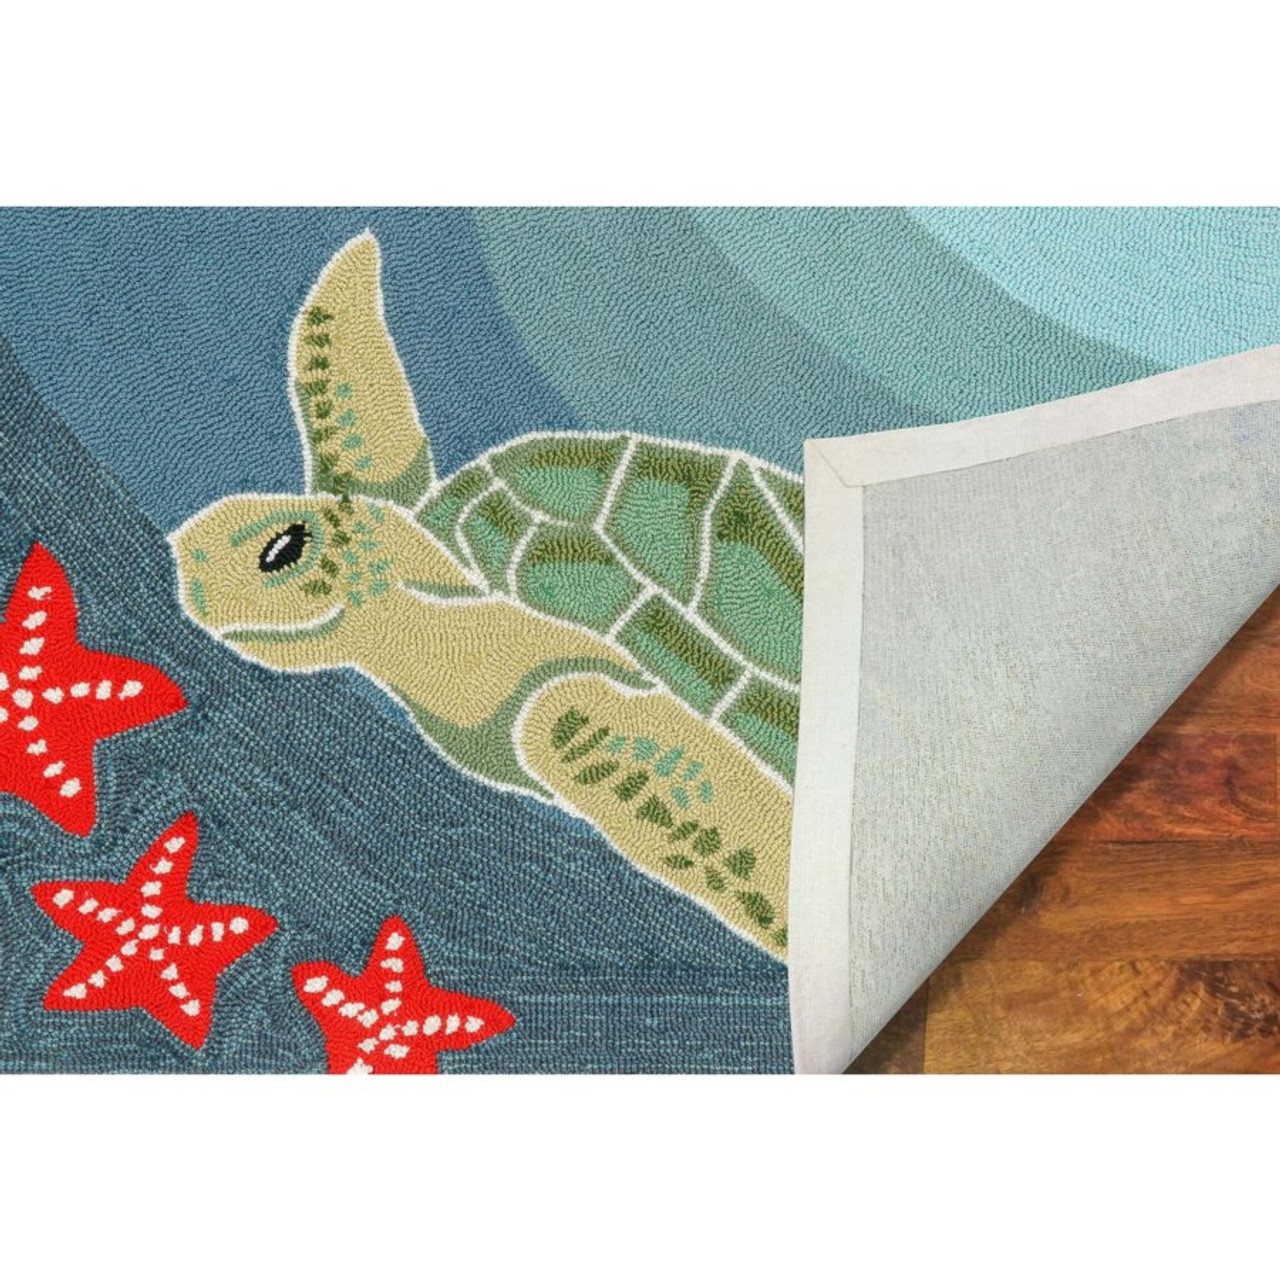 Sea Turtle Indoor/Outdoor Rug  -  Backing